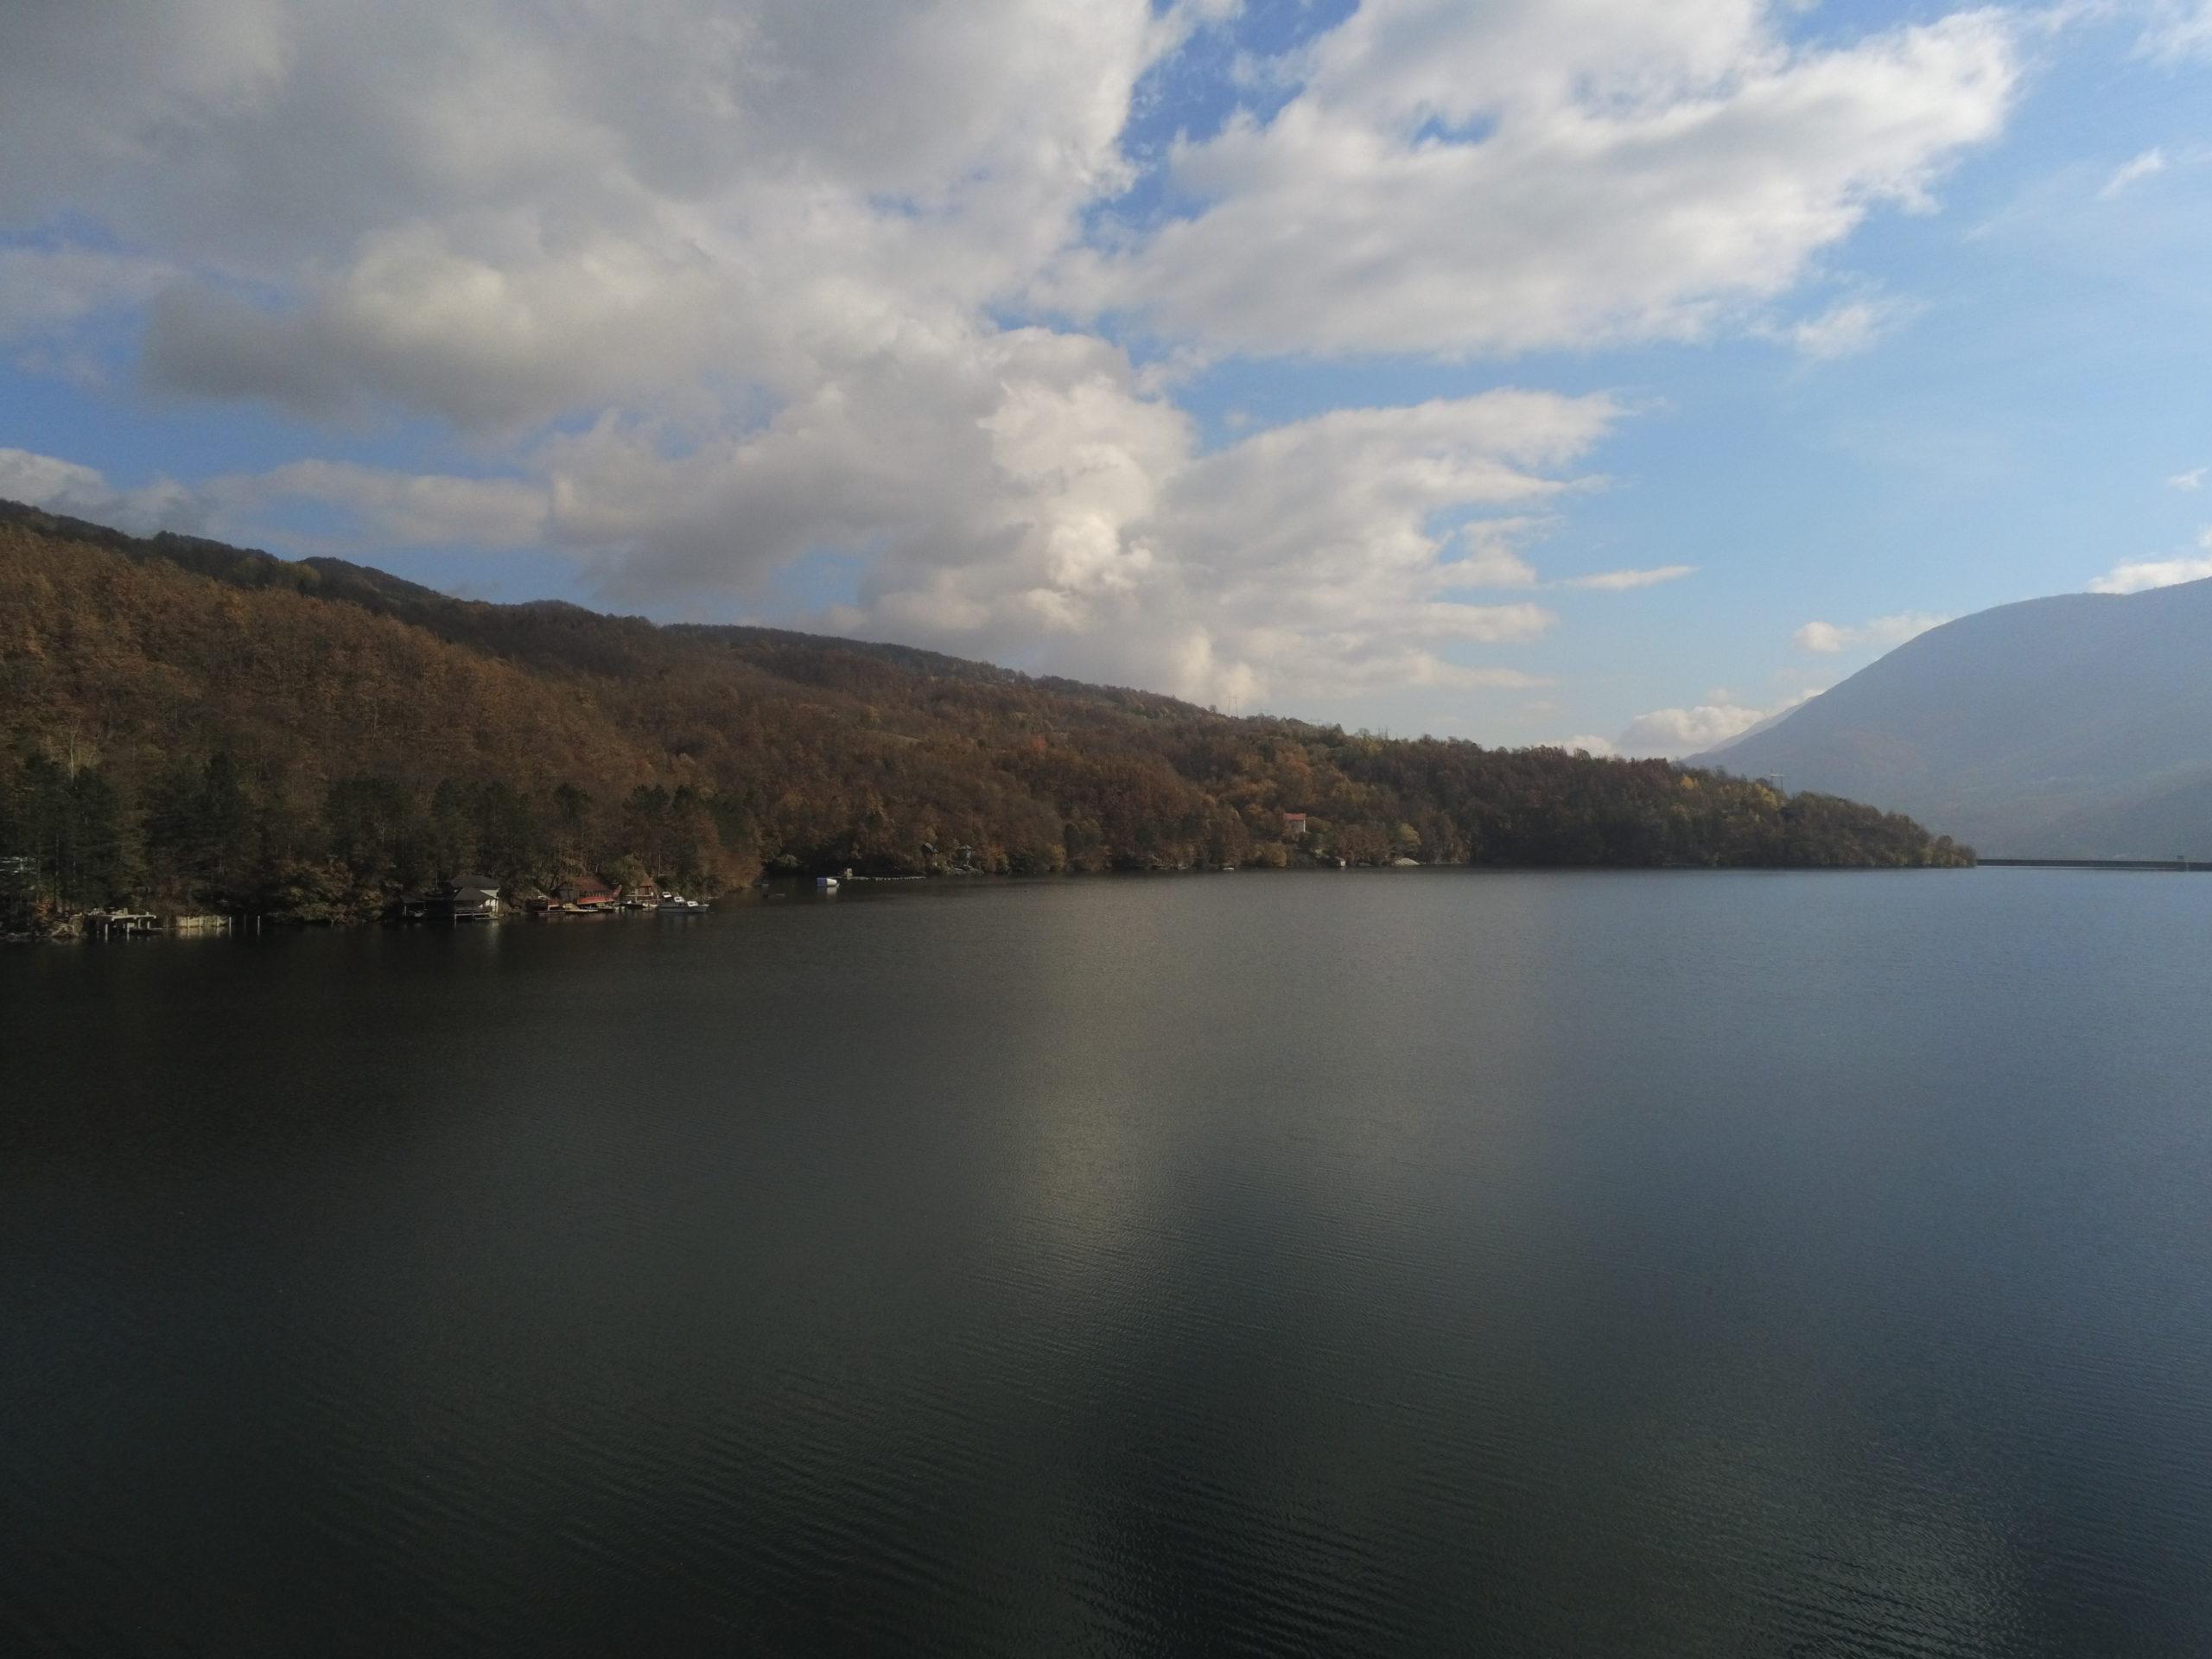 Lake Perucac - Drone